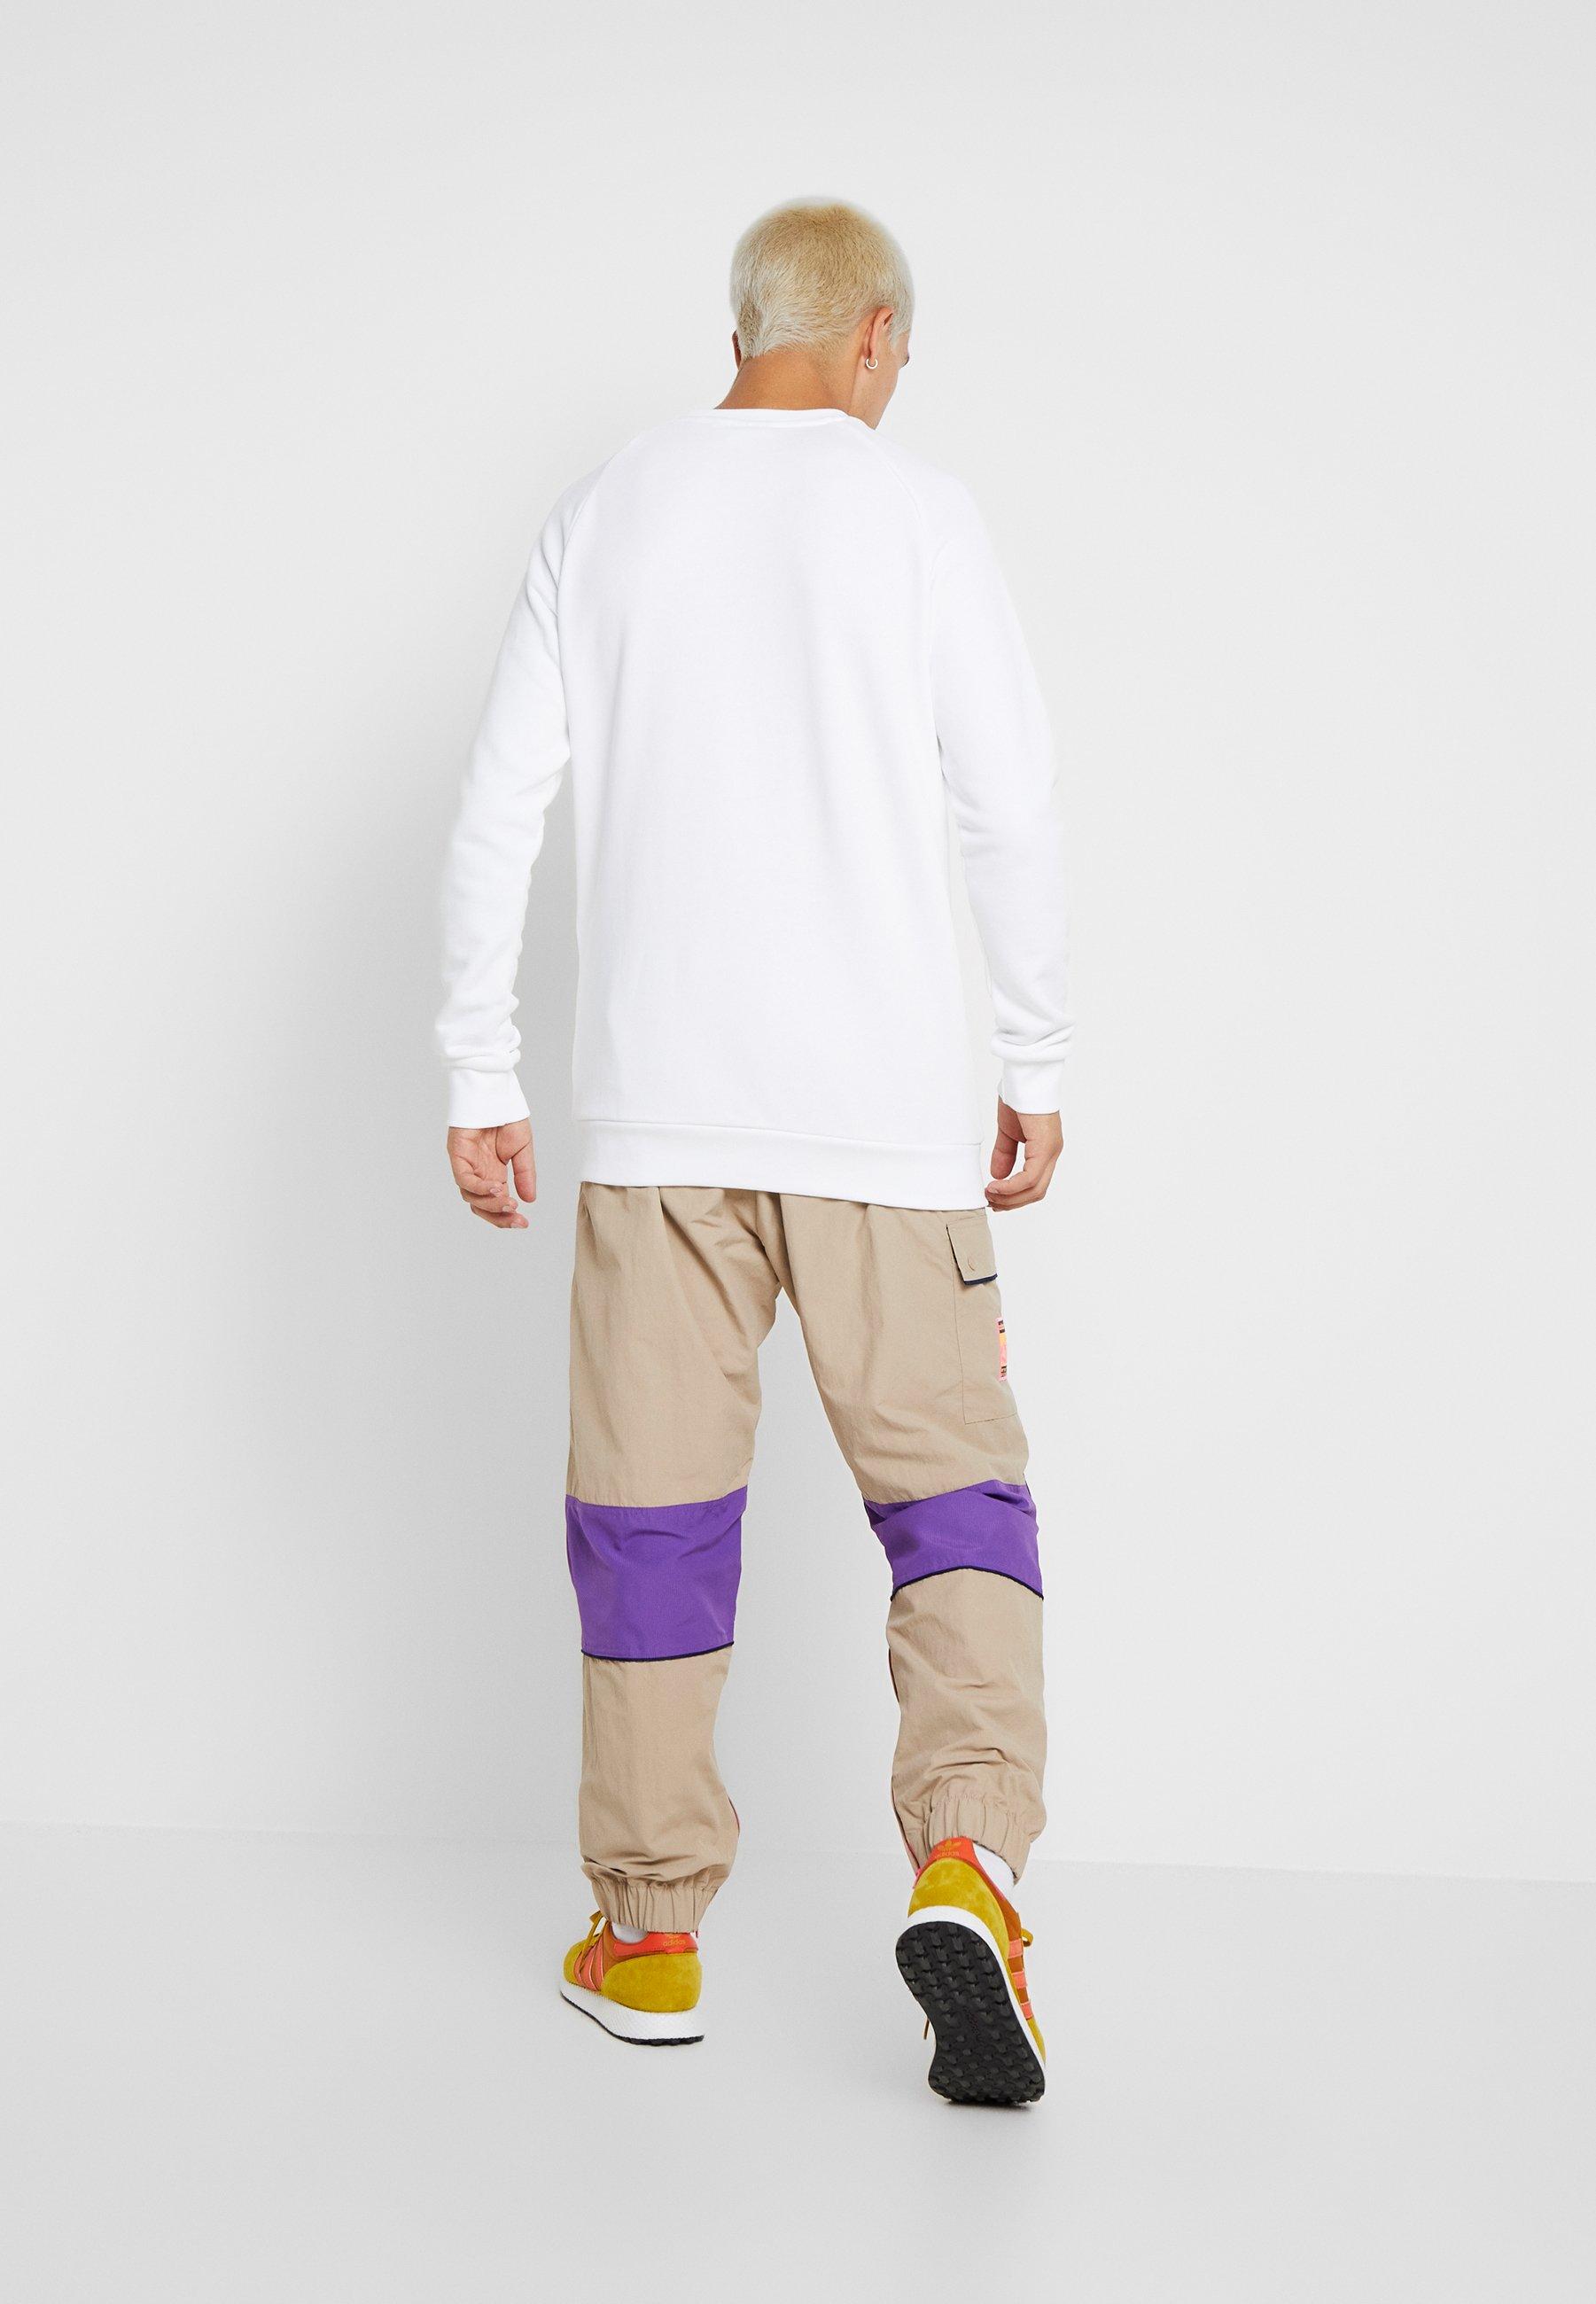 Adidas PantPantalon De Track Survêtement Beige Originals FuTKJ31cl